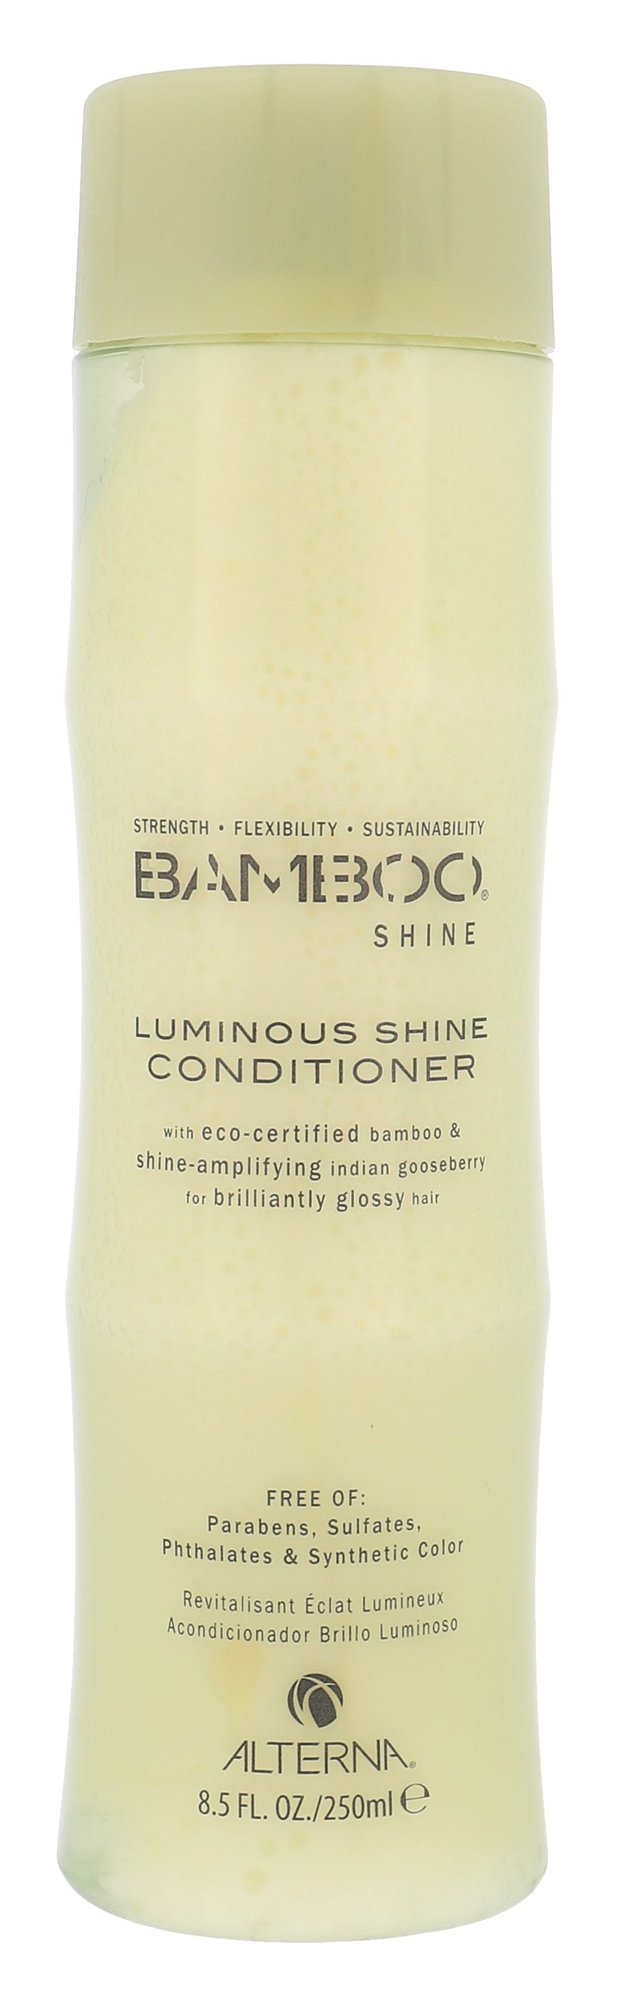 Alterna Bamboo Shine Cosmetic 250ml